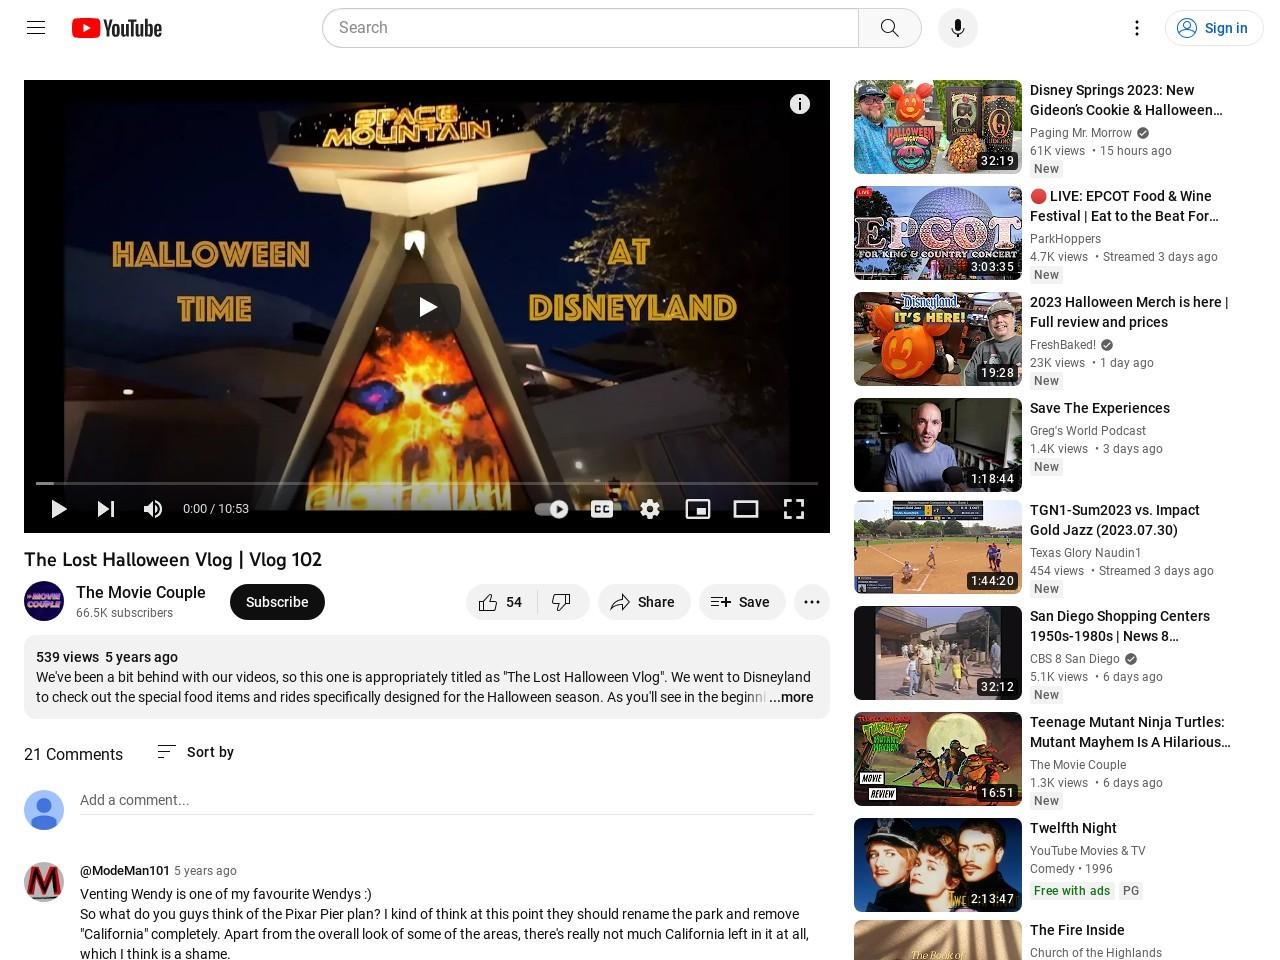 The Lost Halloween Vlog | Vlog 102